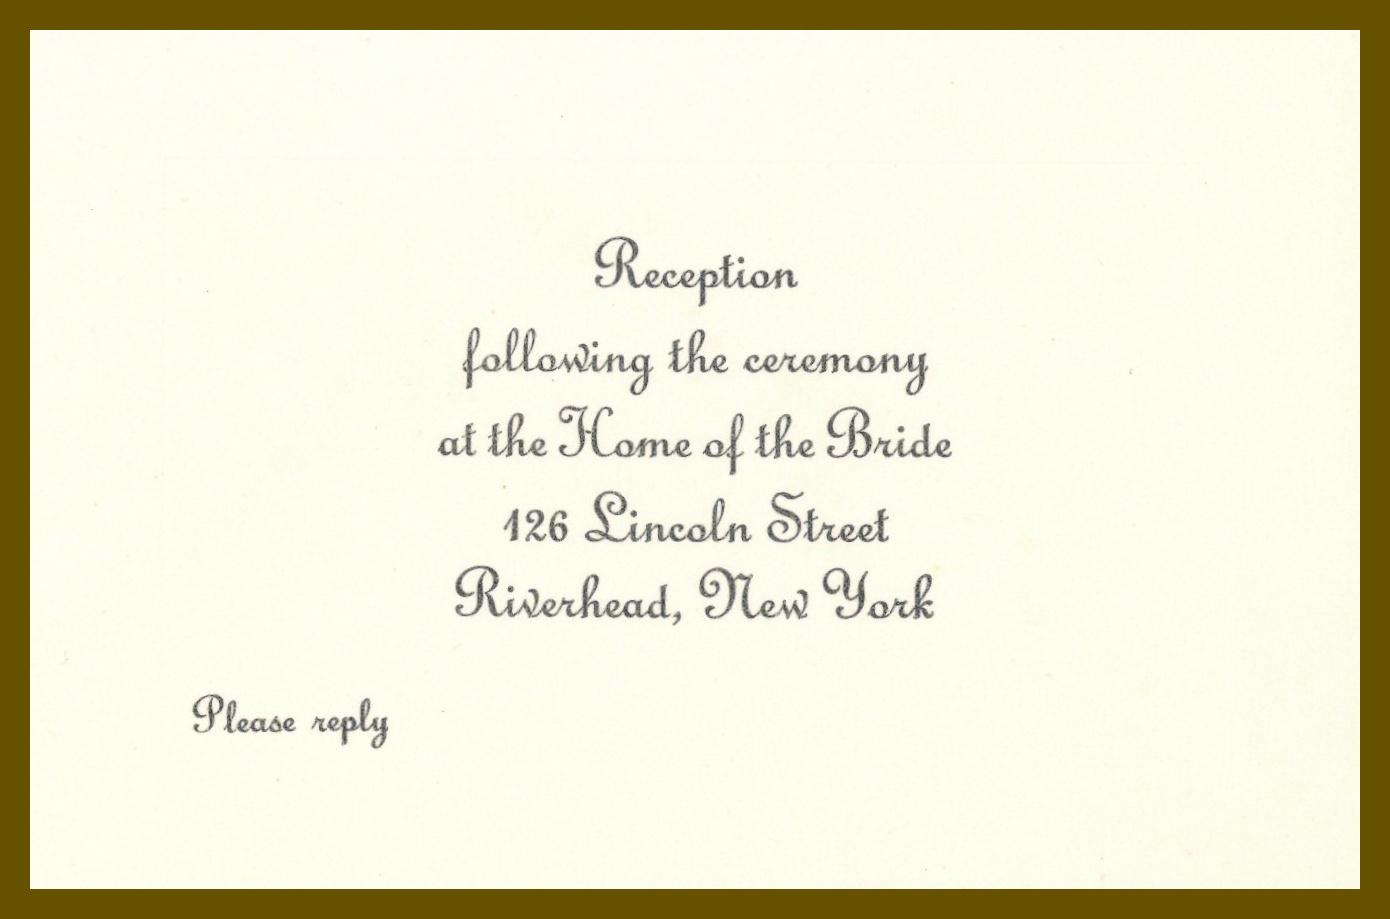 Invitation letter wedding paperinvite june and art the wedding invitation stopboris Images